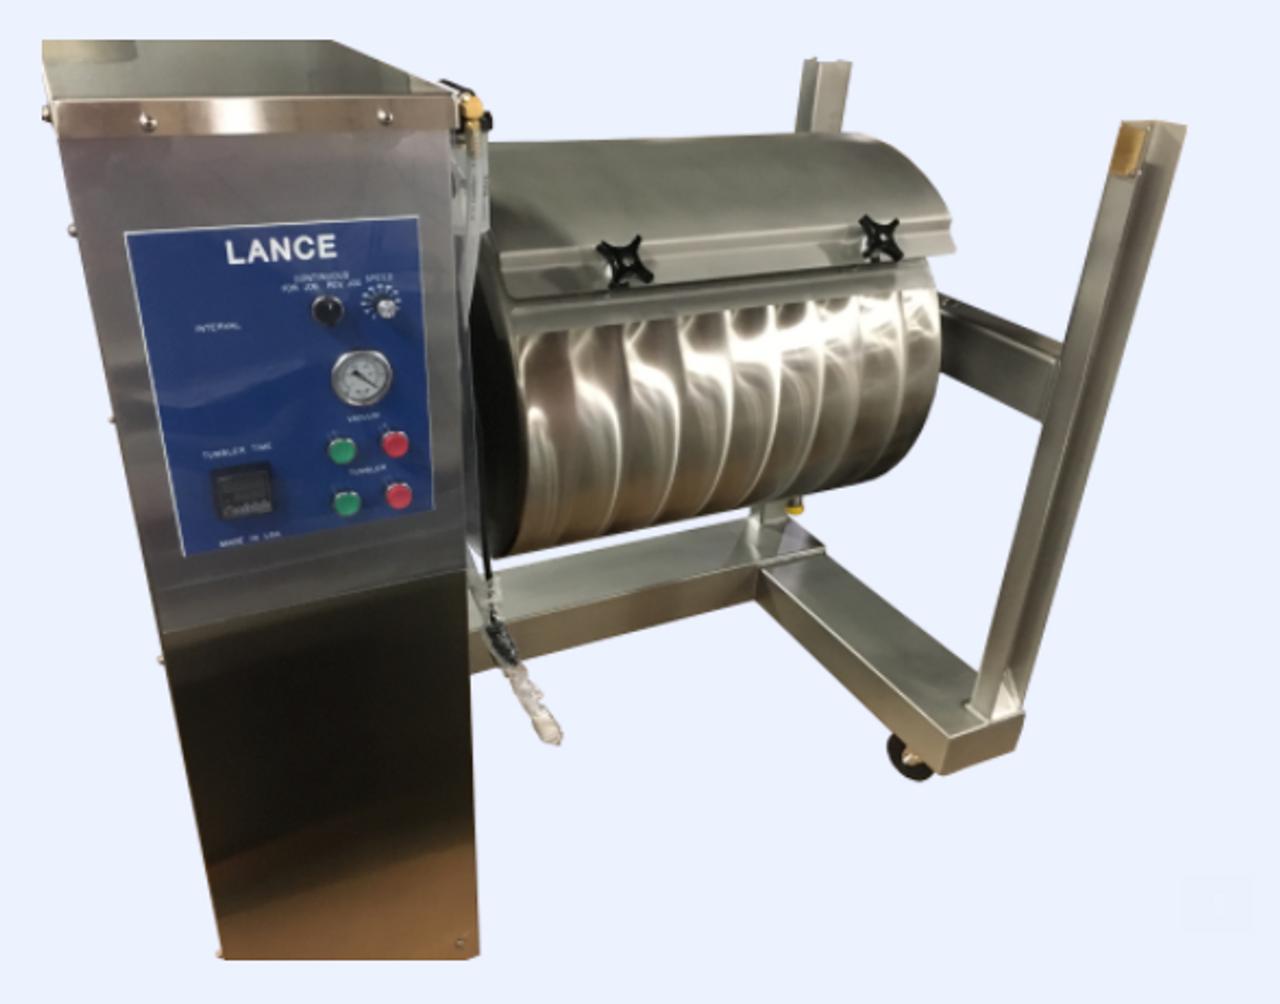 LT-15 - 200lb. Lance Industries Vacuum Massage Tumbler